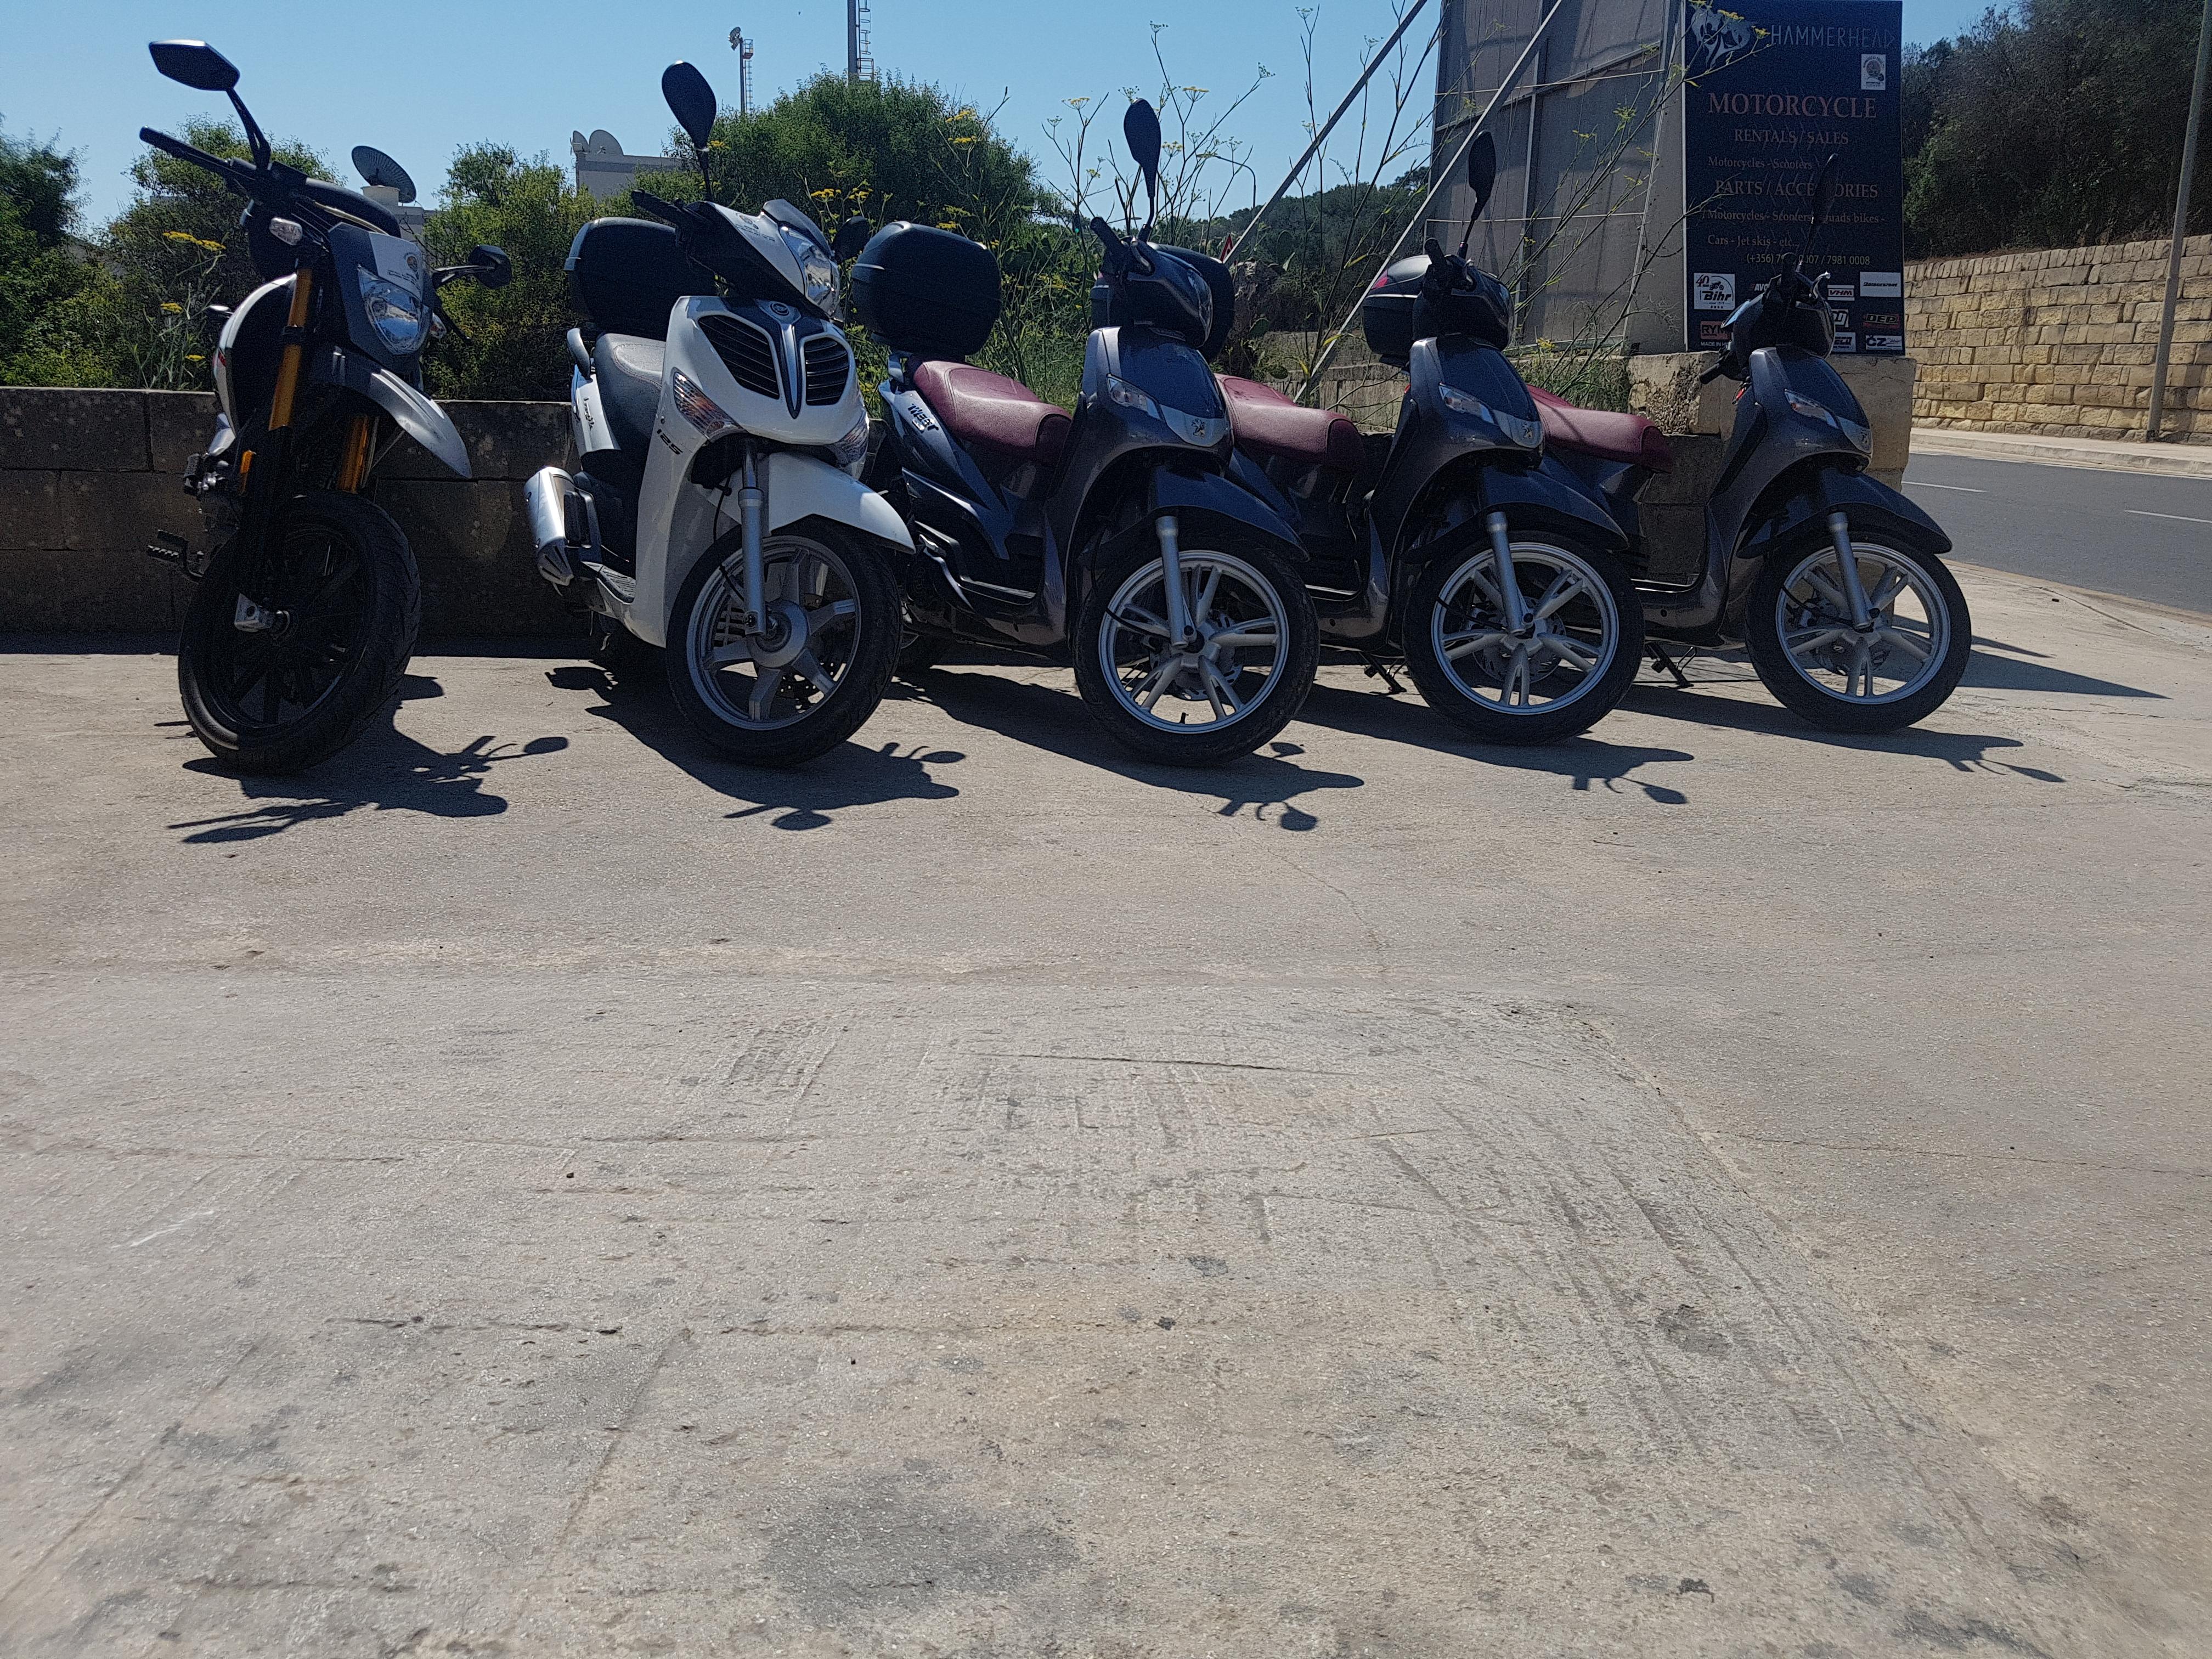 rental bikes outside